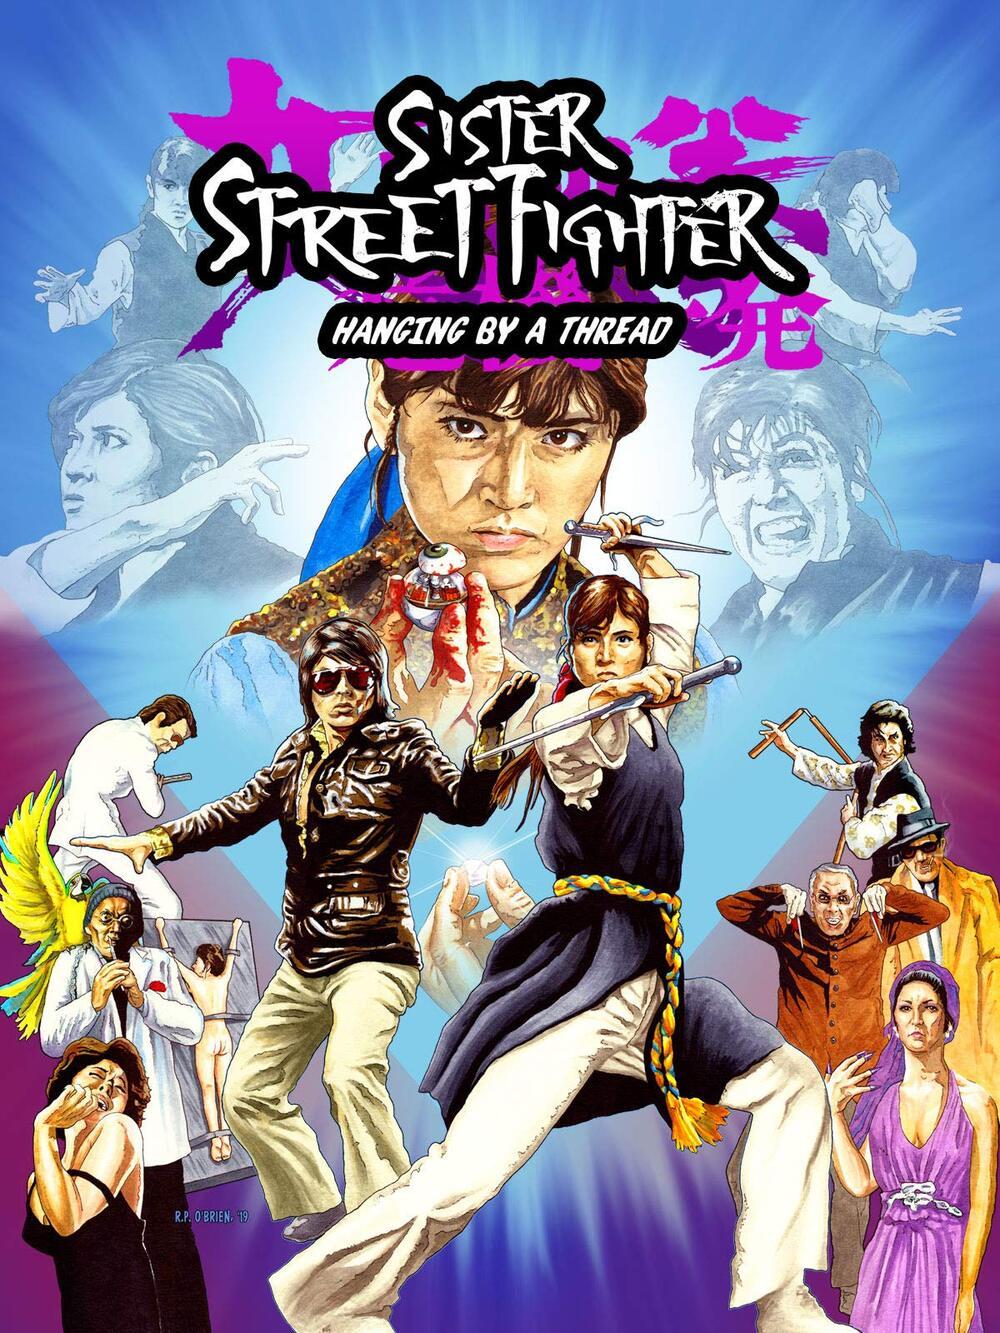 Onna Hissatsu Ken: Kiki Ippatsu / Sister Street Fighter: Hanging by a Thread (1974)